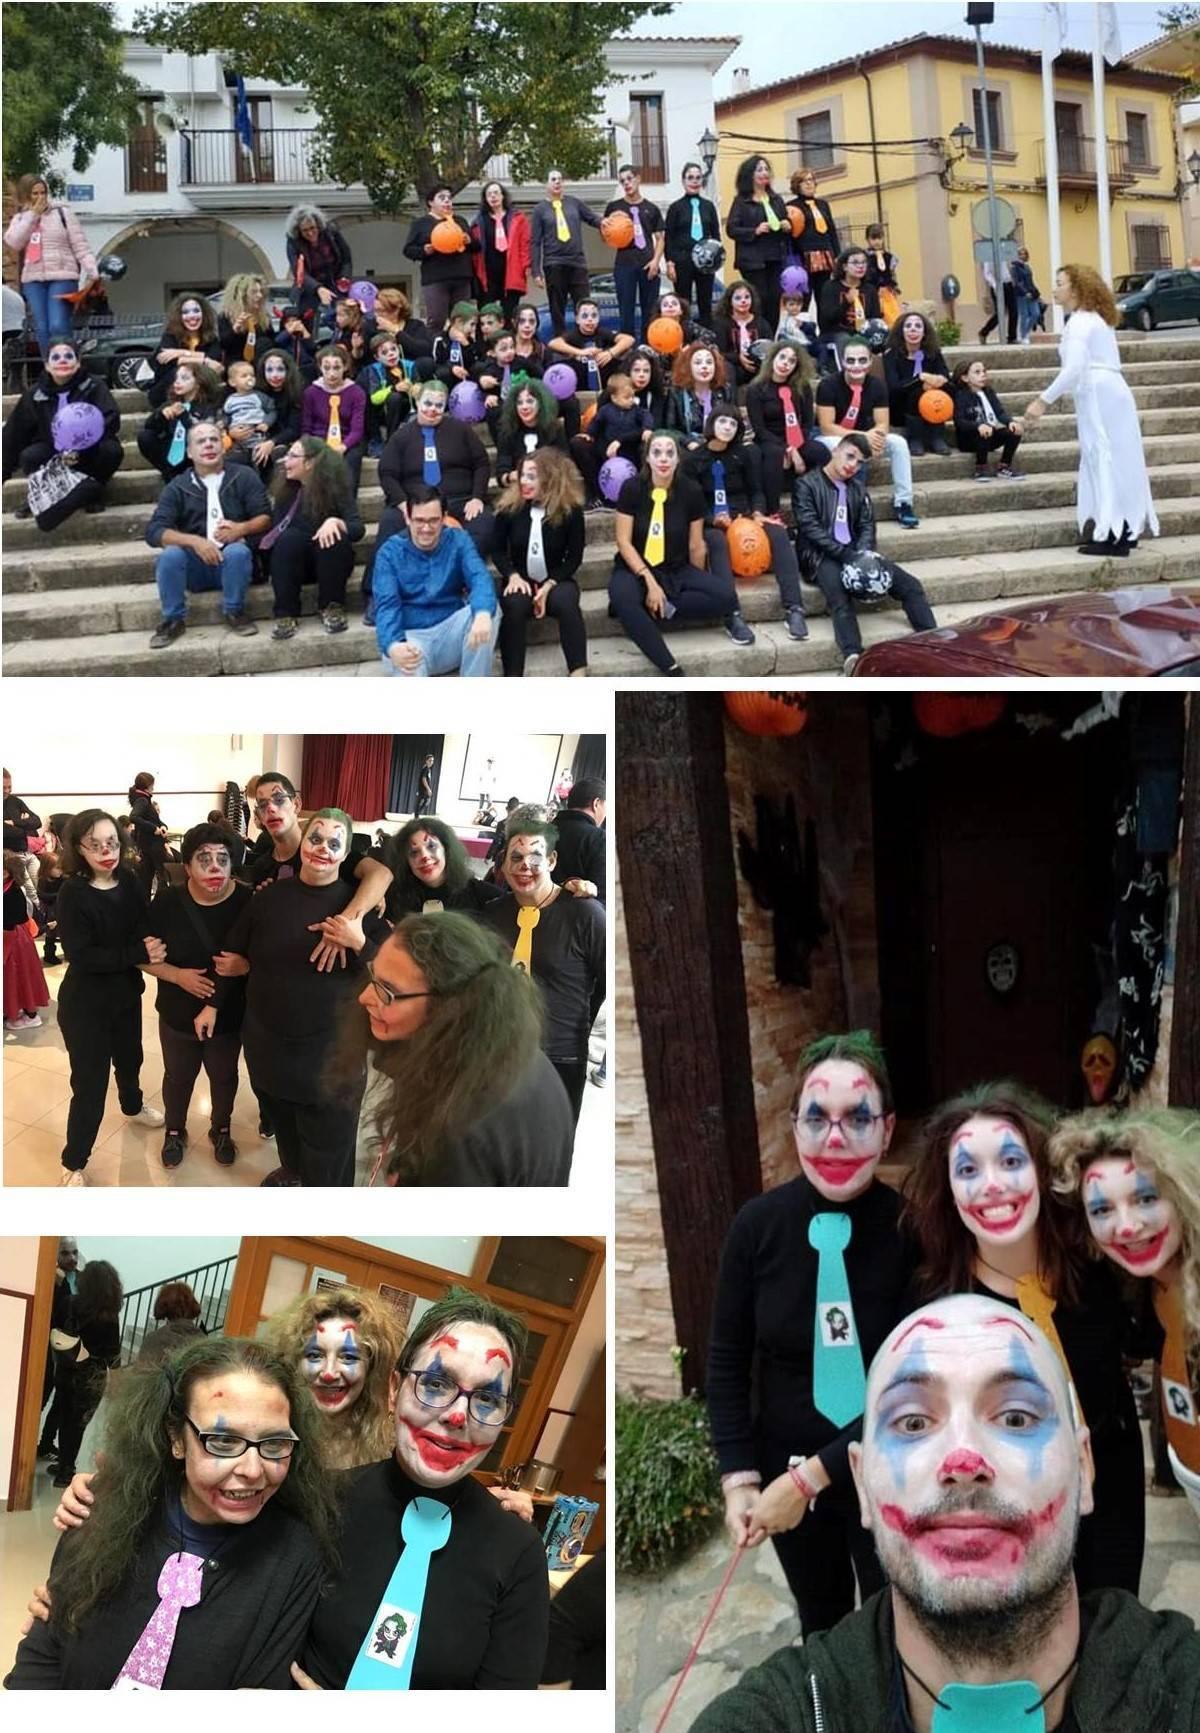 Happy Halloween Berzocana 2019